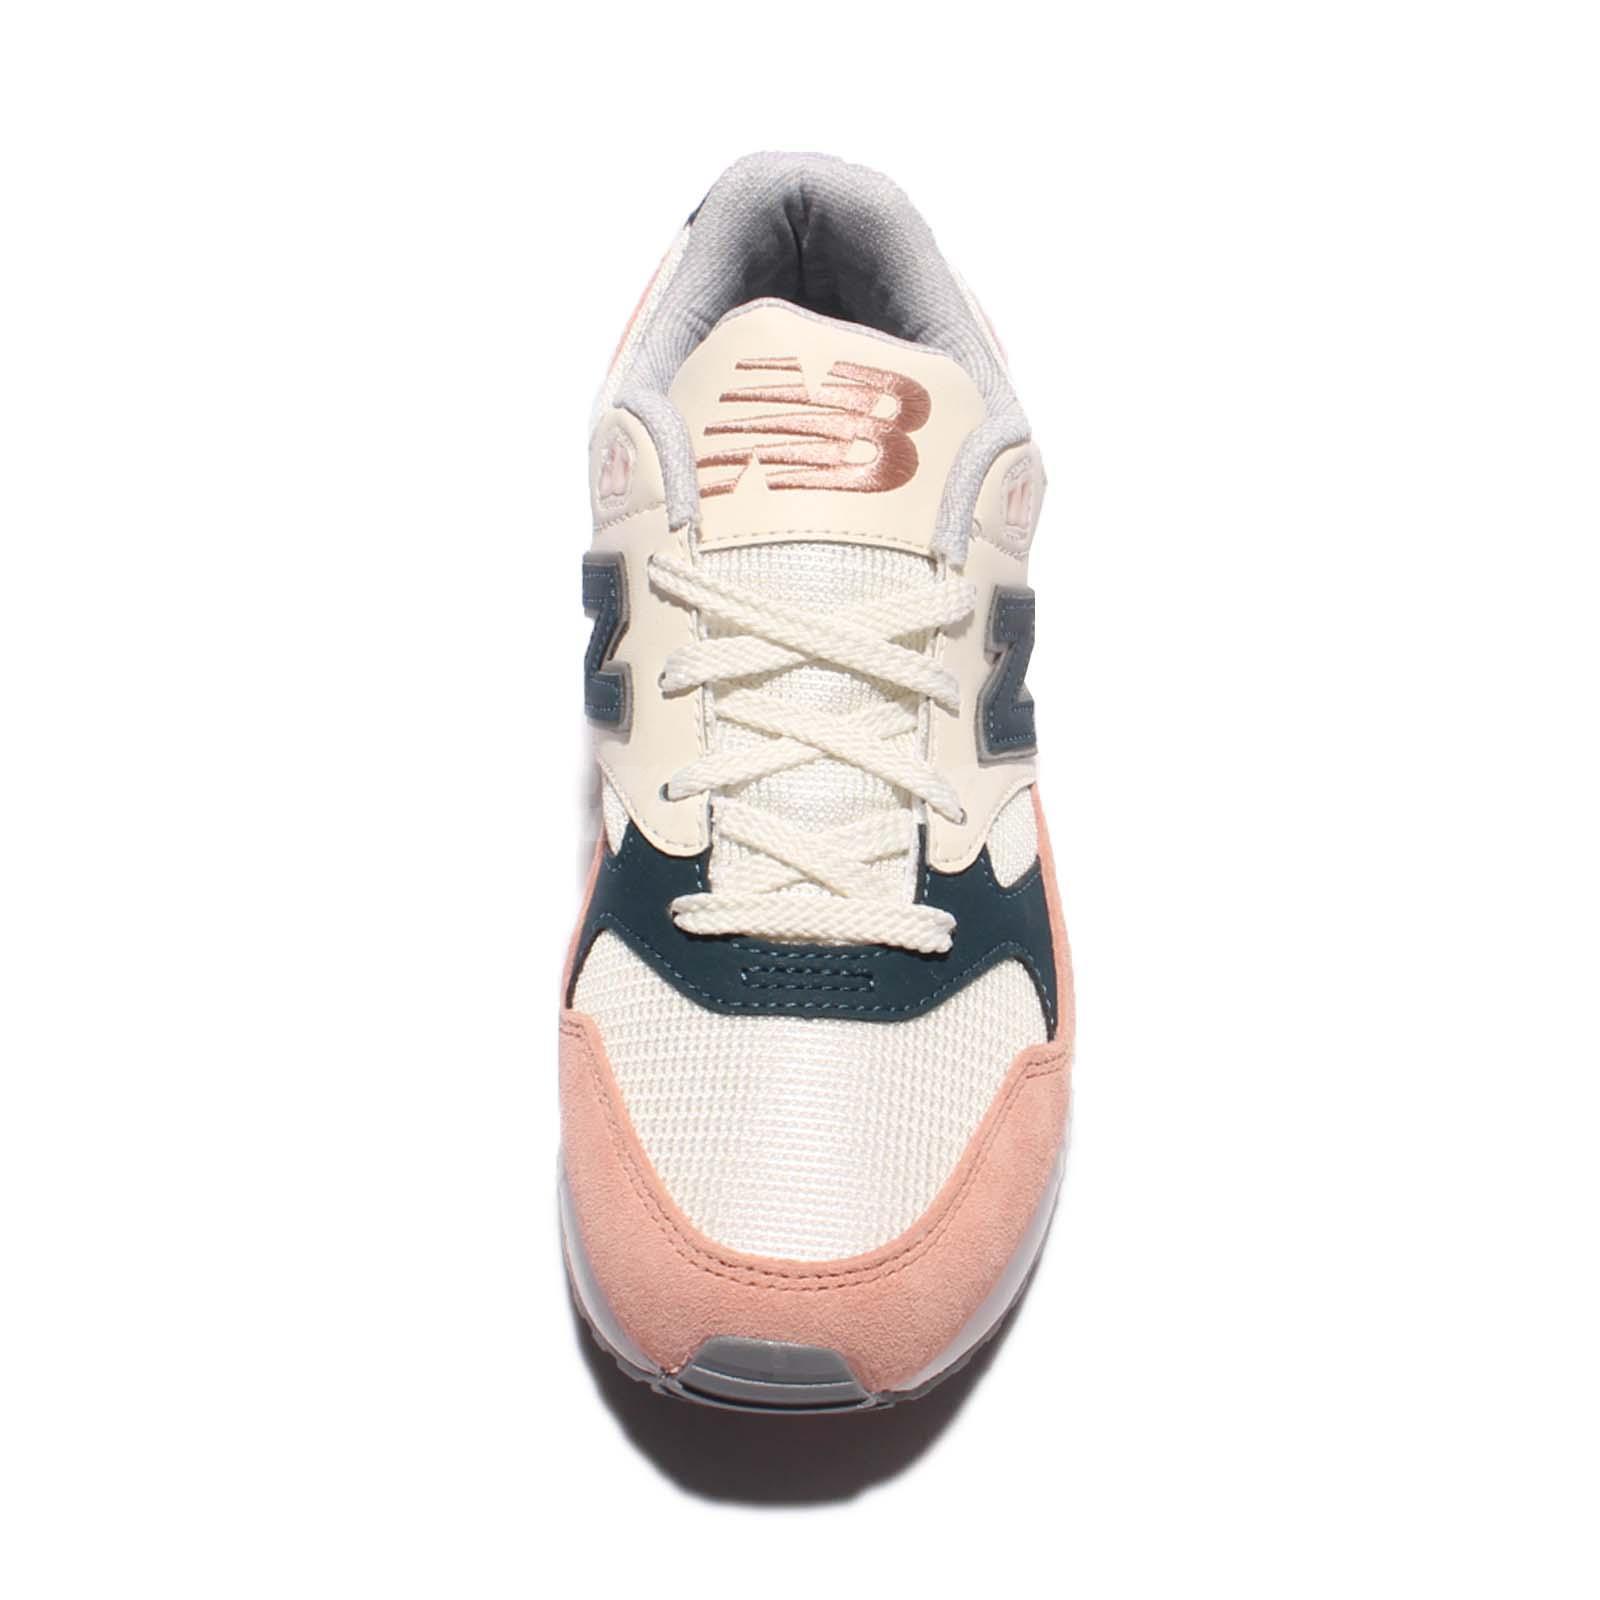 plutôt sympa 3d7fb 23487 new balance 530 encap pink